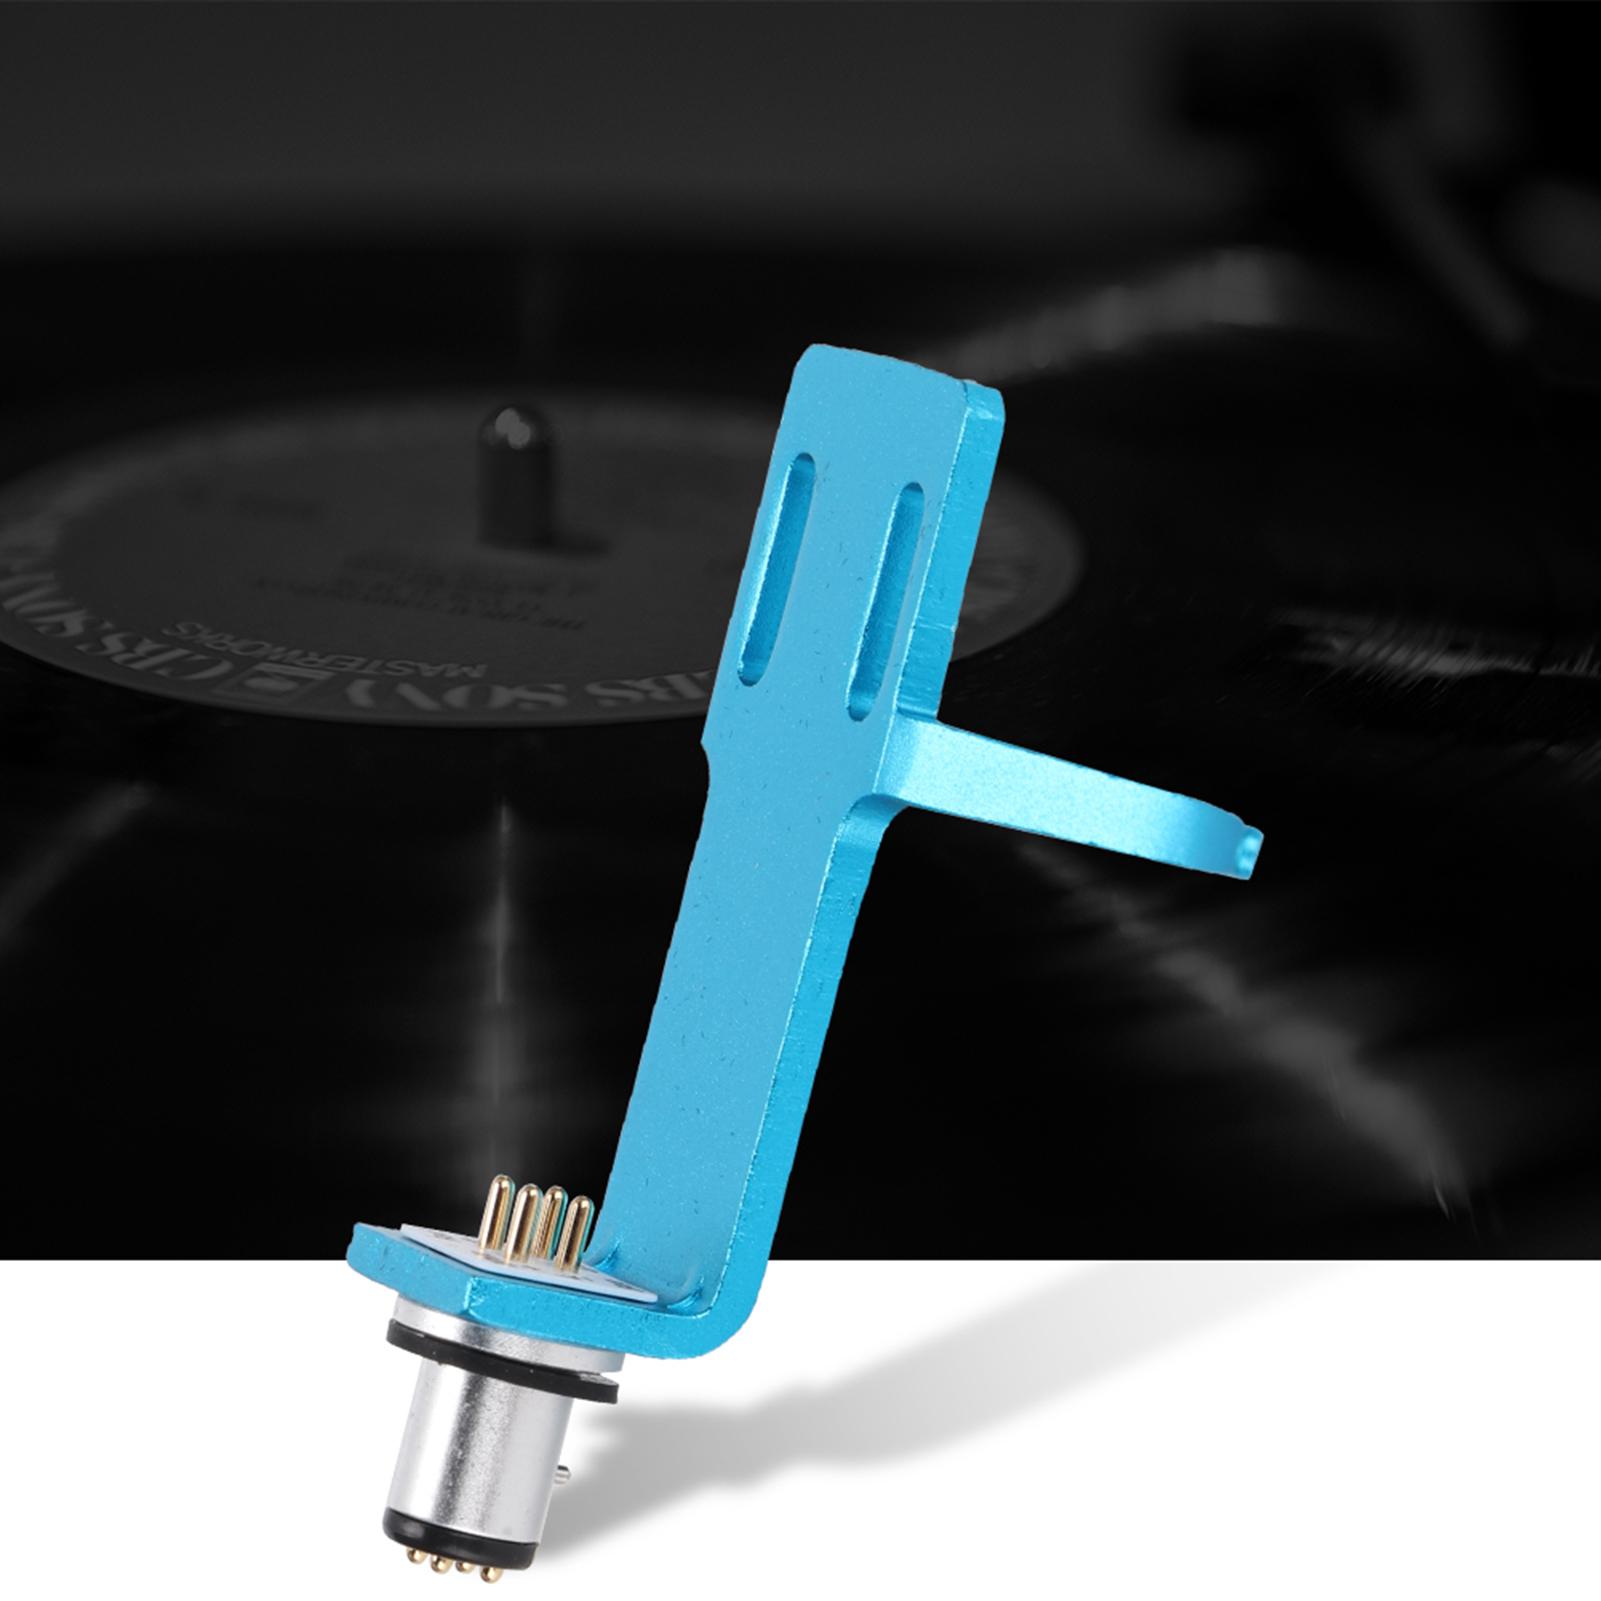 Universal-Phono-Stylus-Holder-Headshell-Cartridge-Keeper-for-LP-Record-Player thumbnail 29